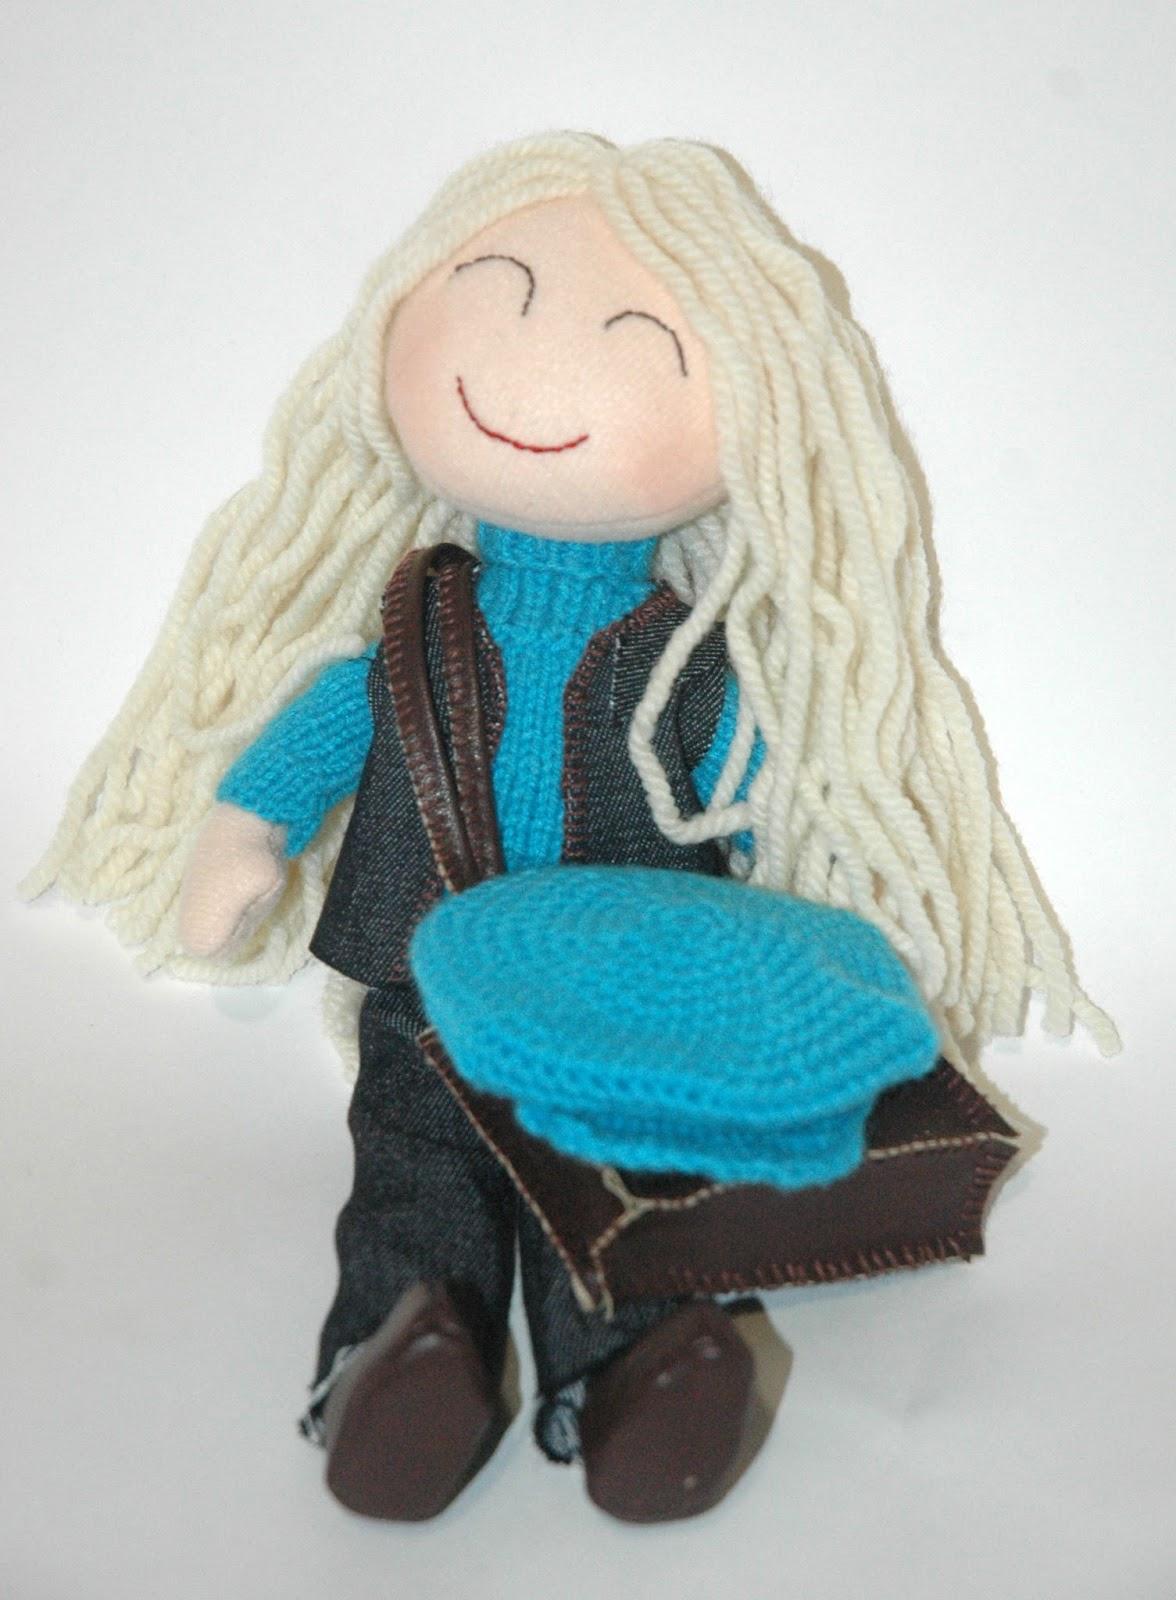 Кукла-примитив Маринка